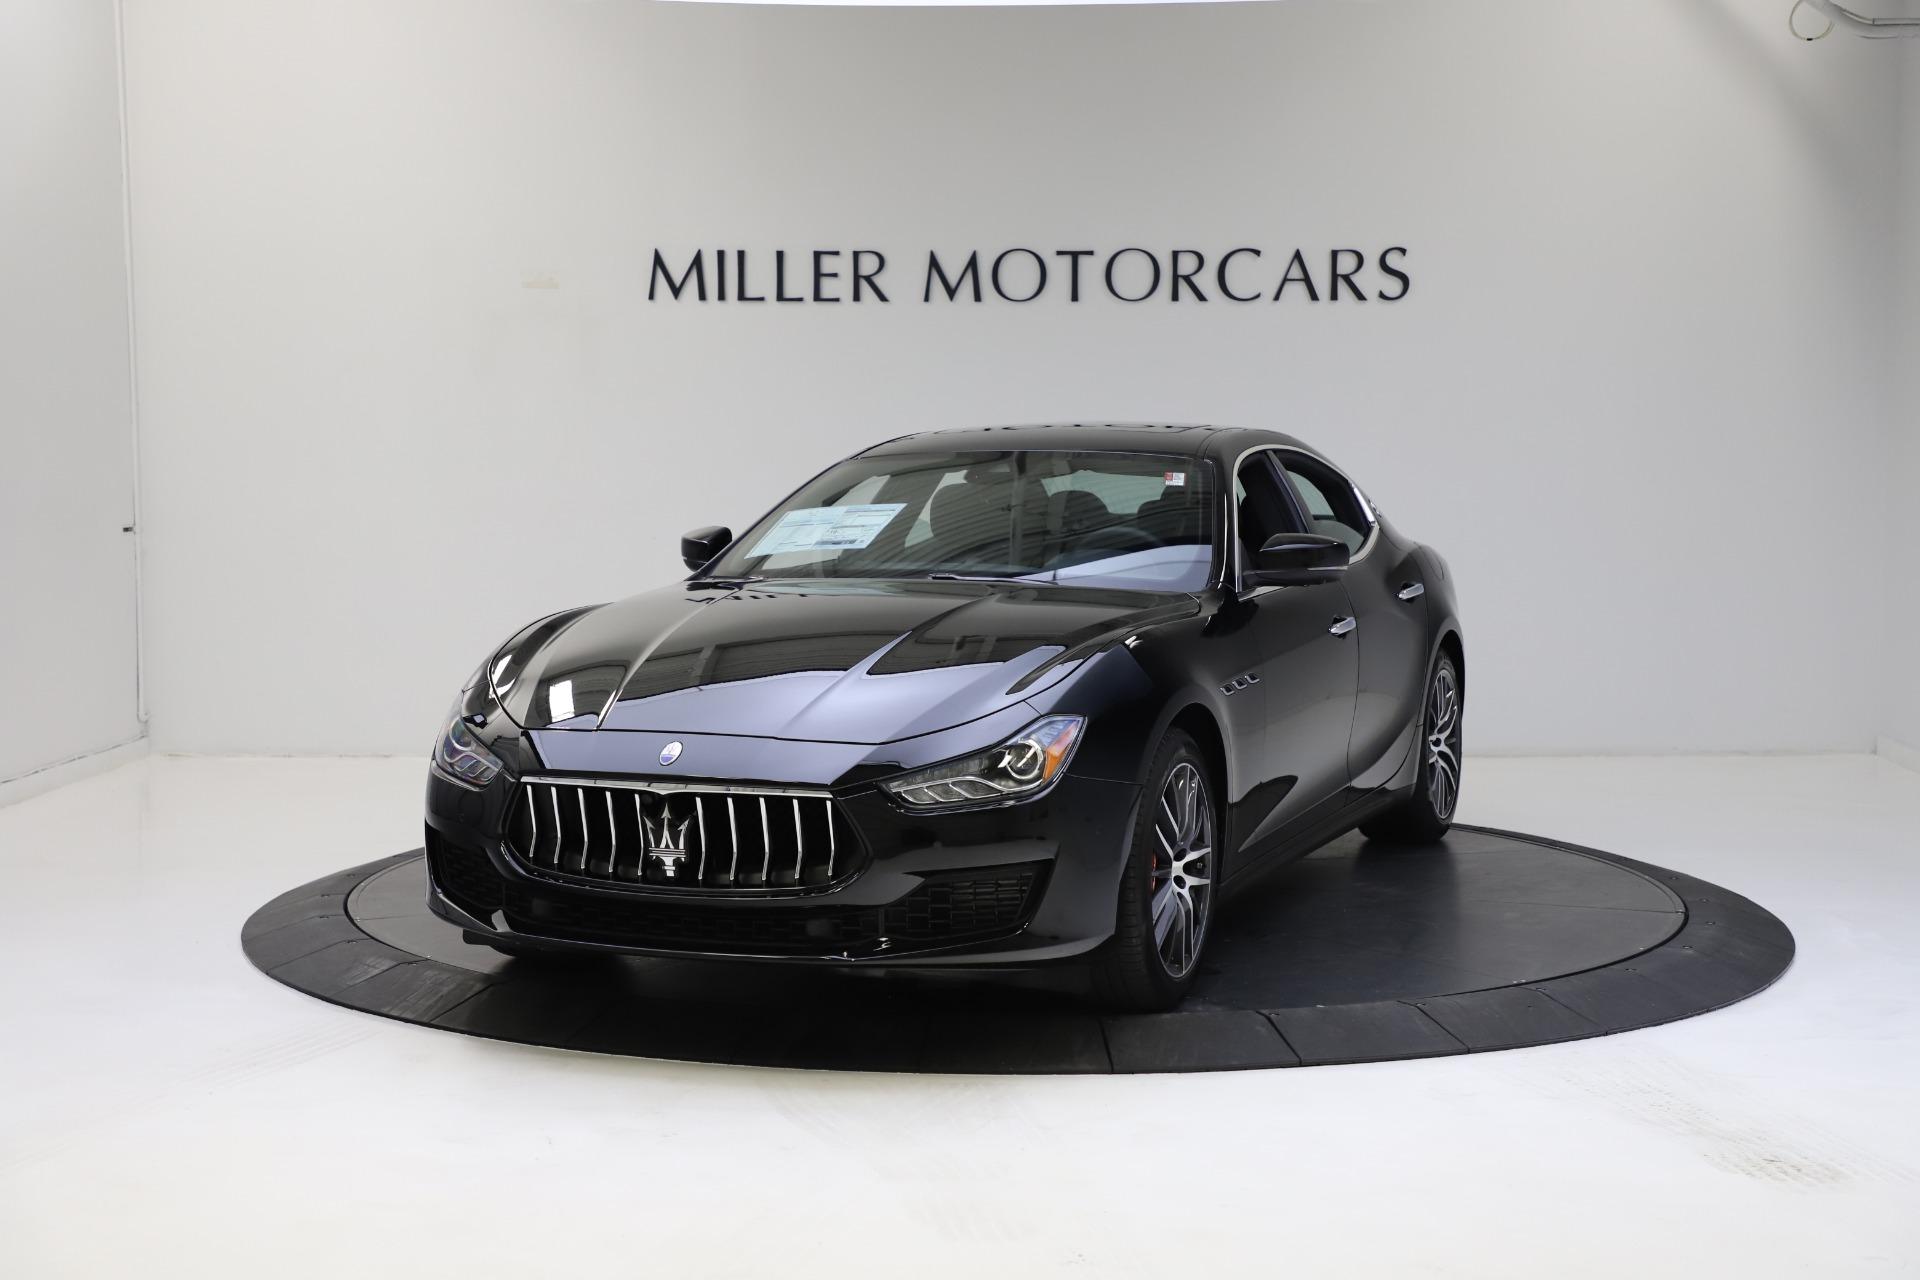 New 2021 Maserati Ghibli S Q4 for sale $86,654 at Alfa Romeo of Greenwich in Greenwich CT 06830 1